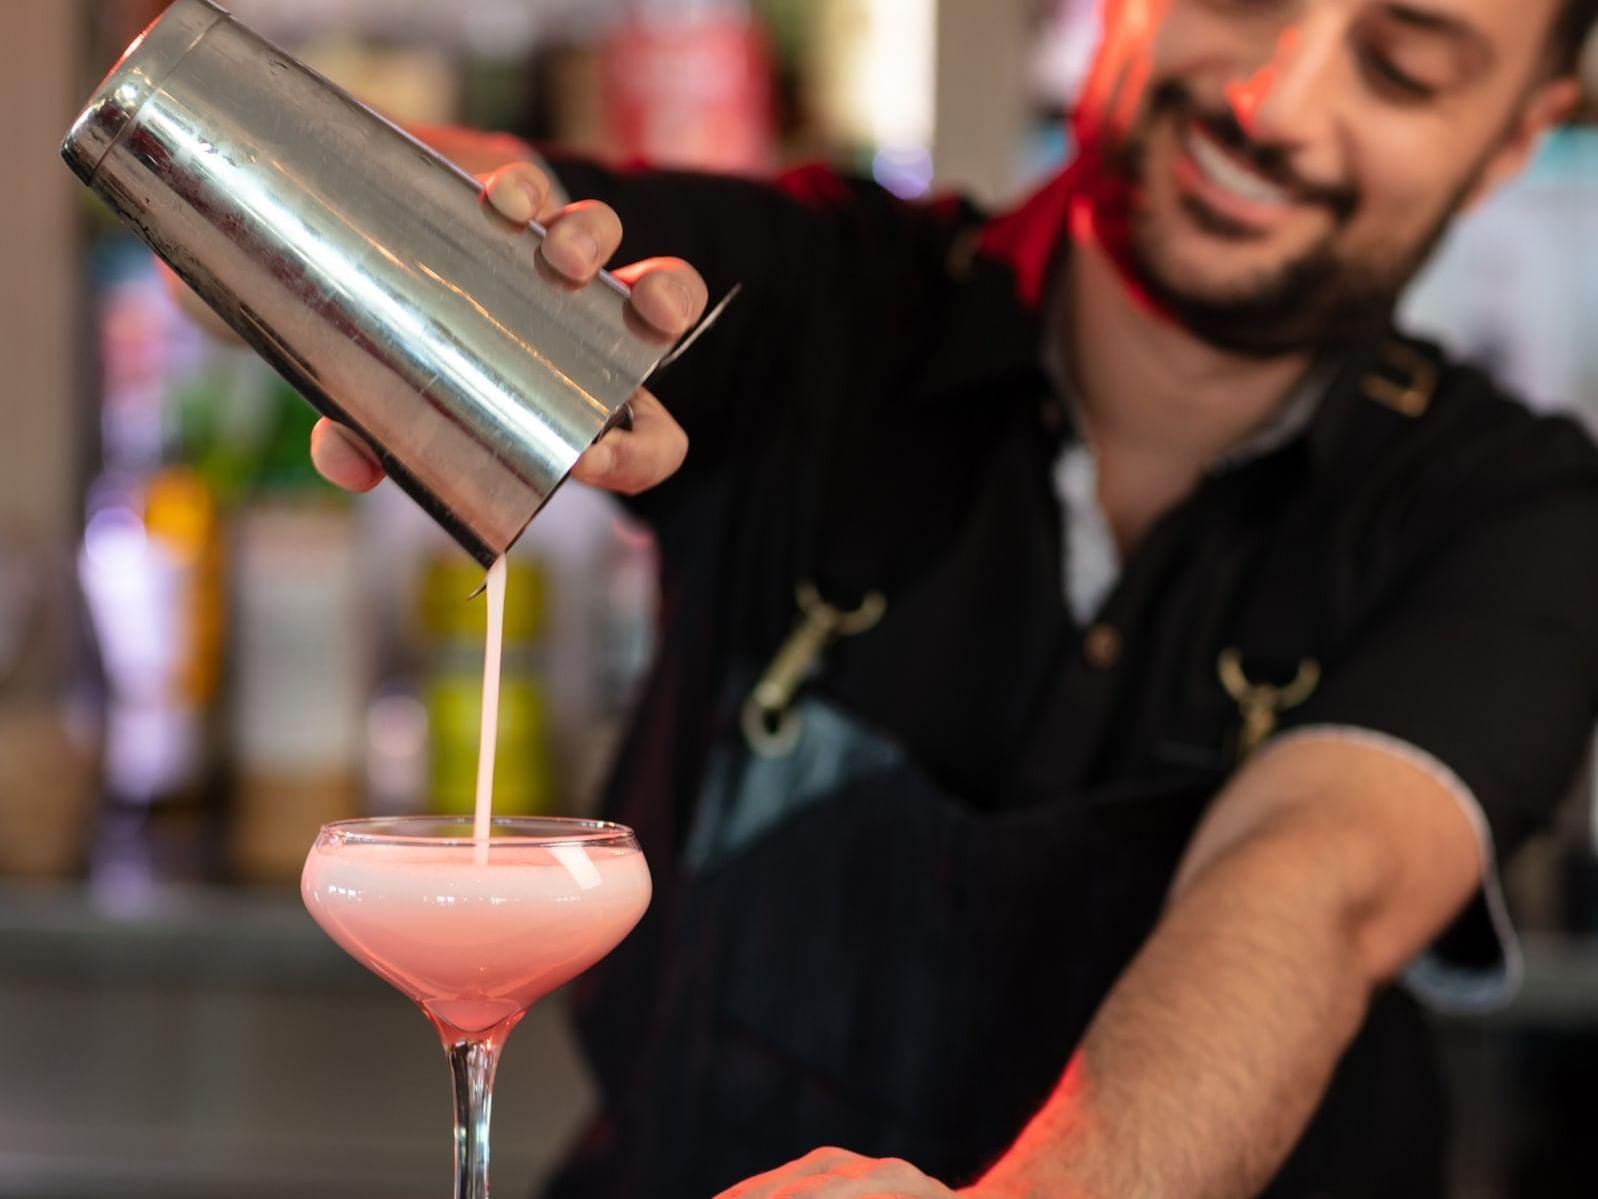 Bartender pouring pink cocktail